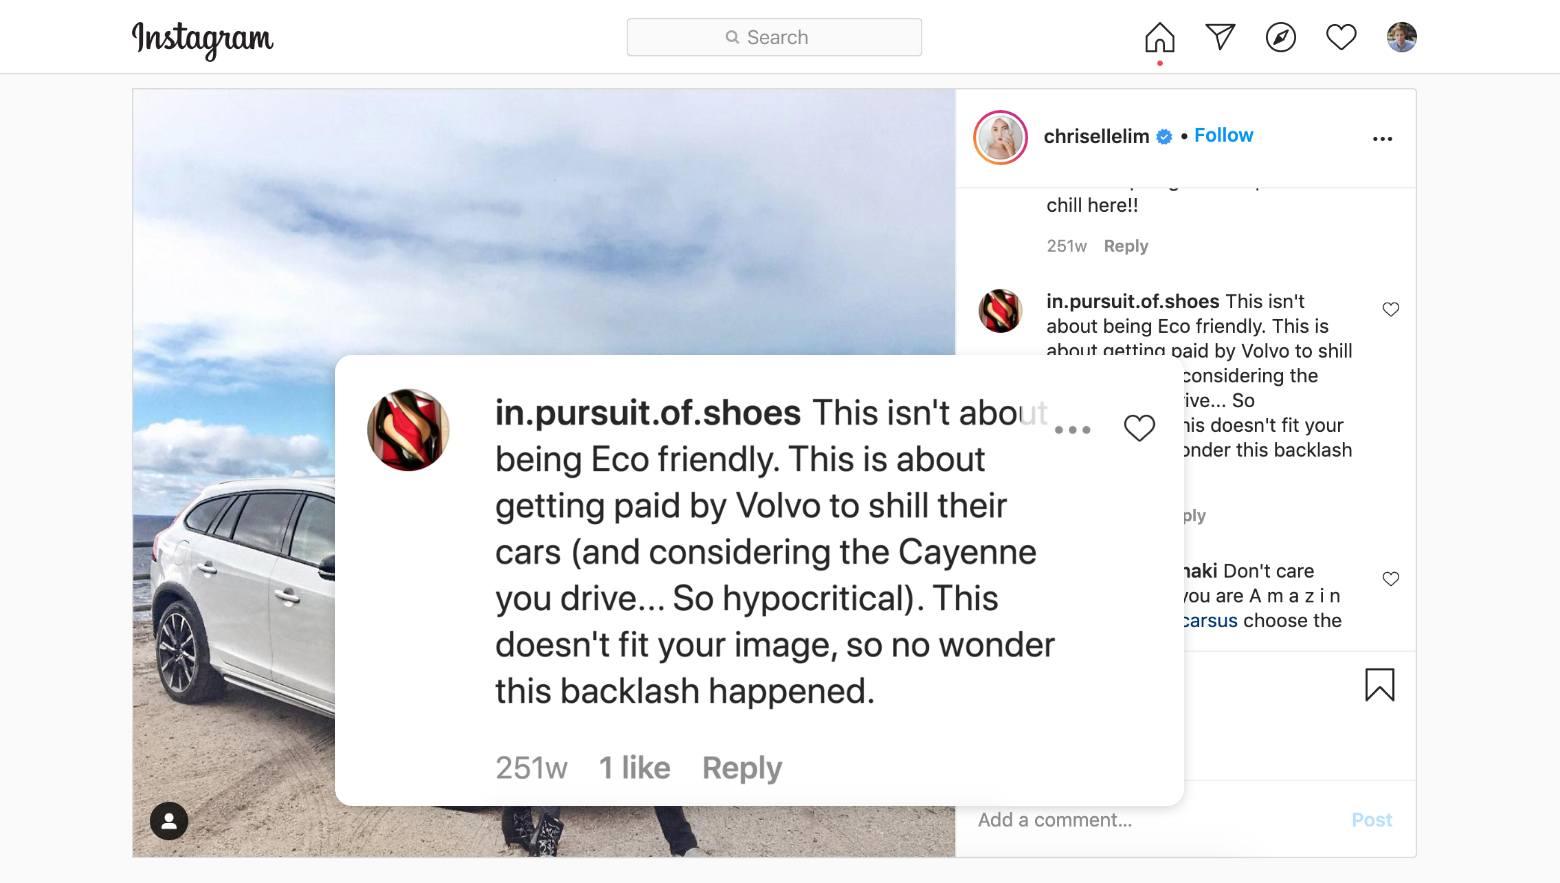 influencer marketing fake social proof